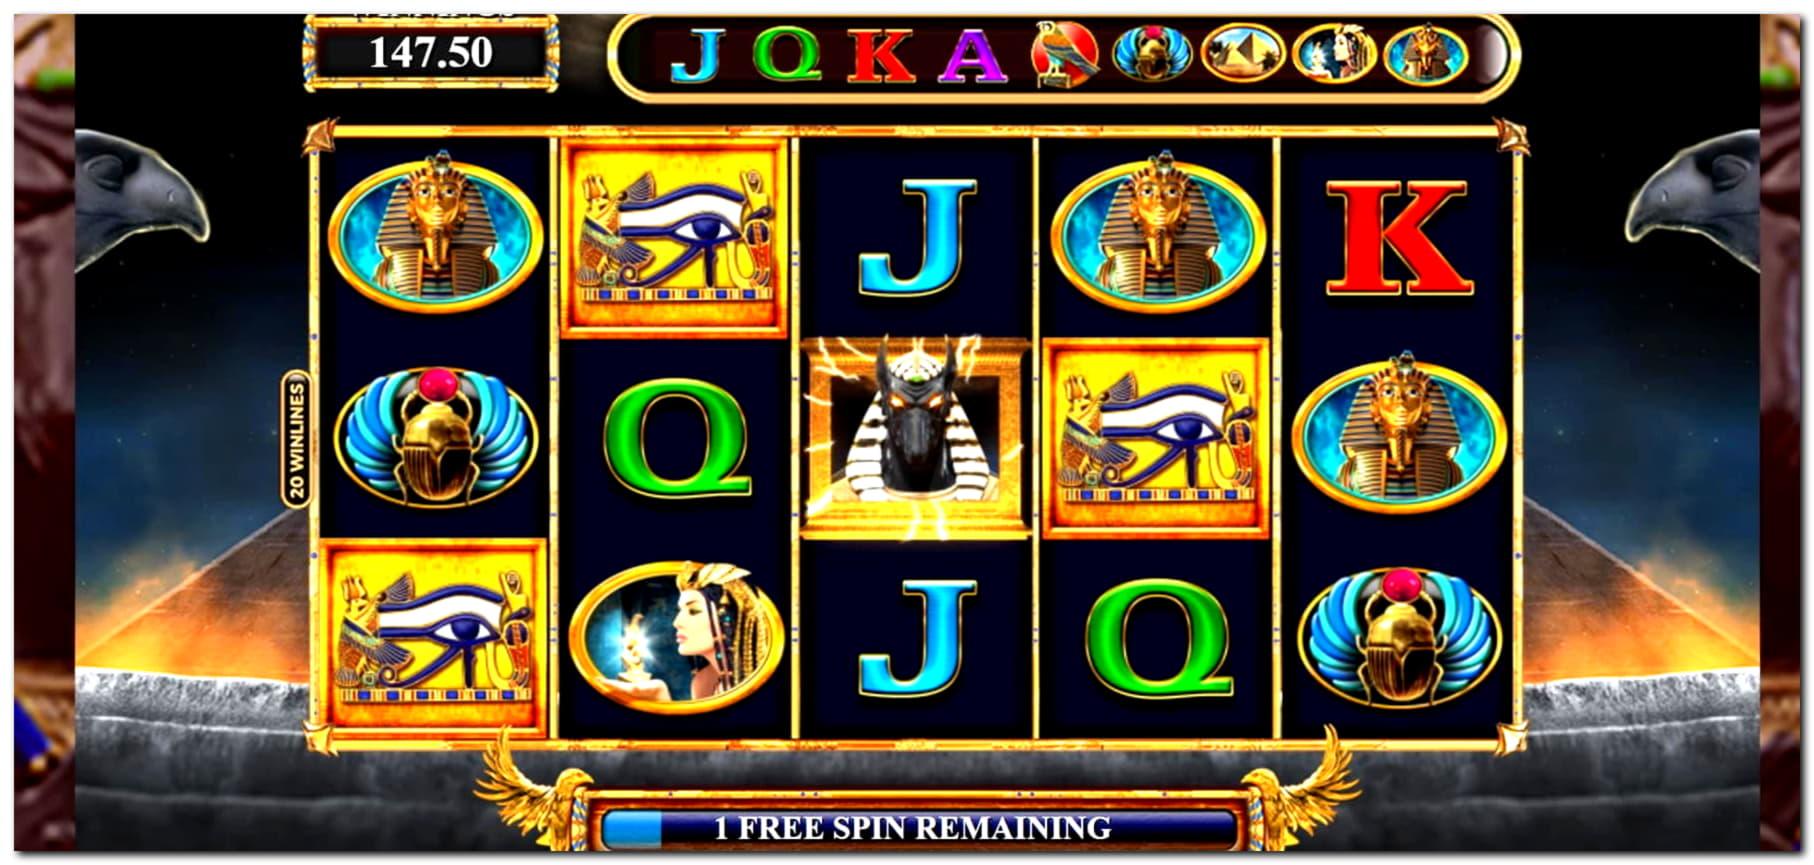 810% Casino Welcome Bonus at Rizk Casino